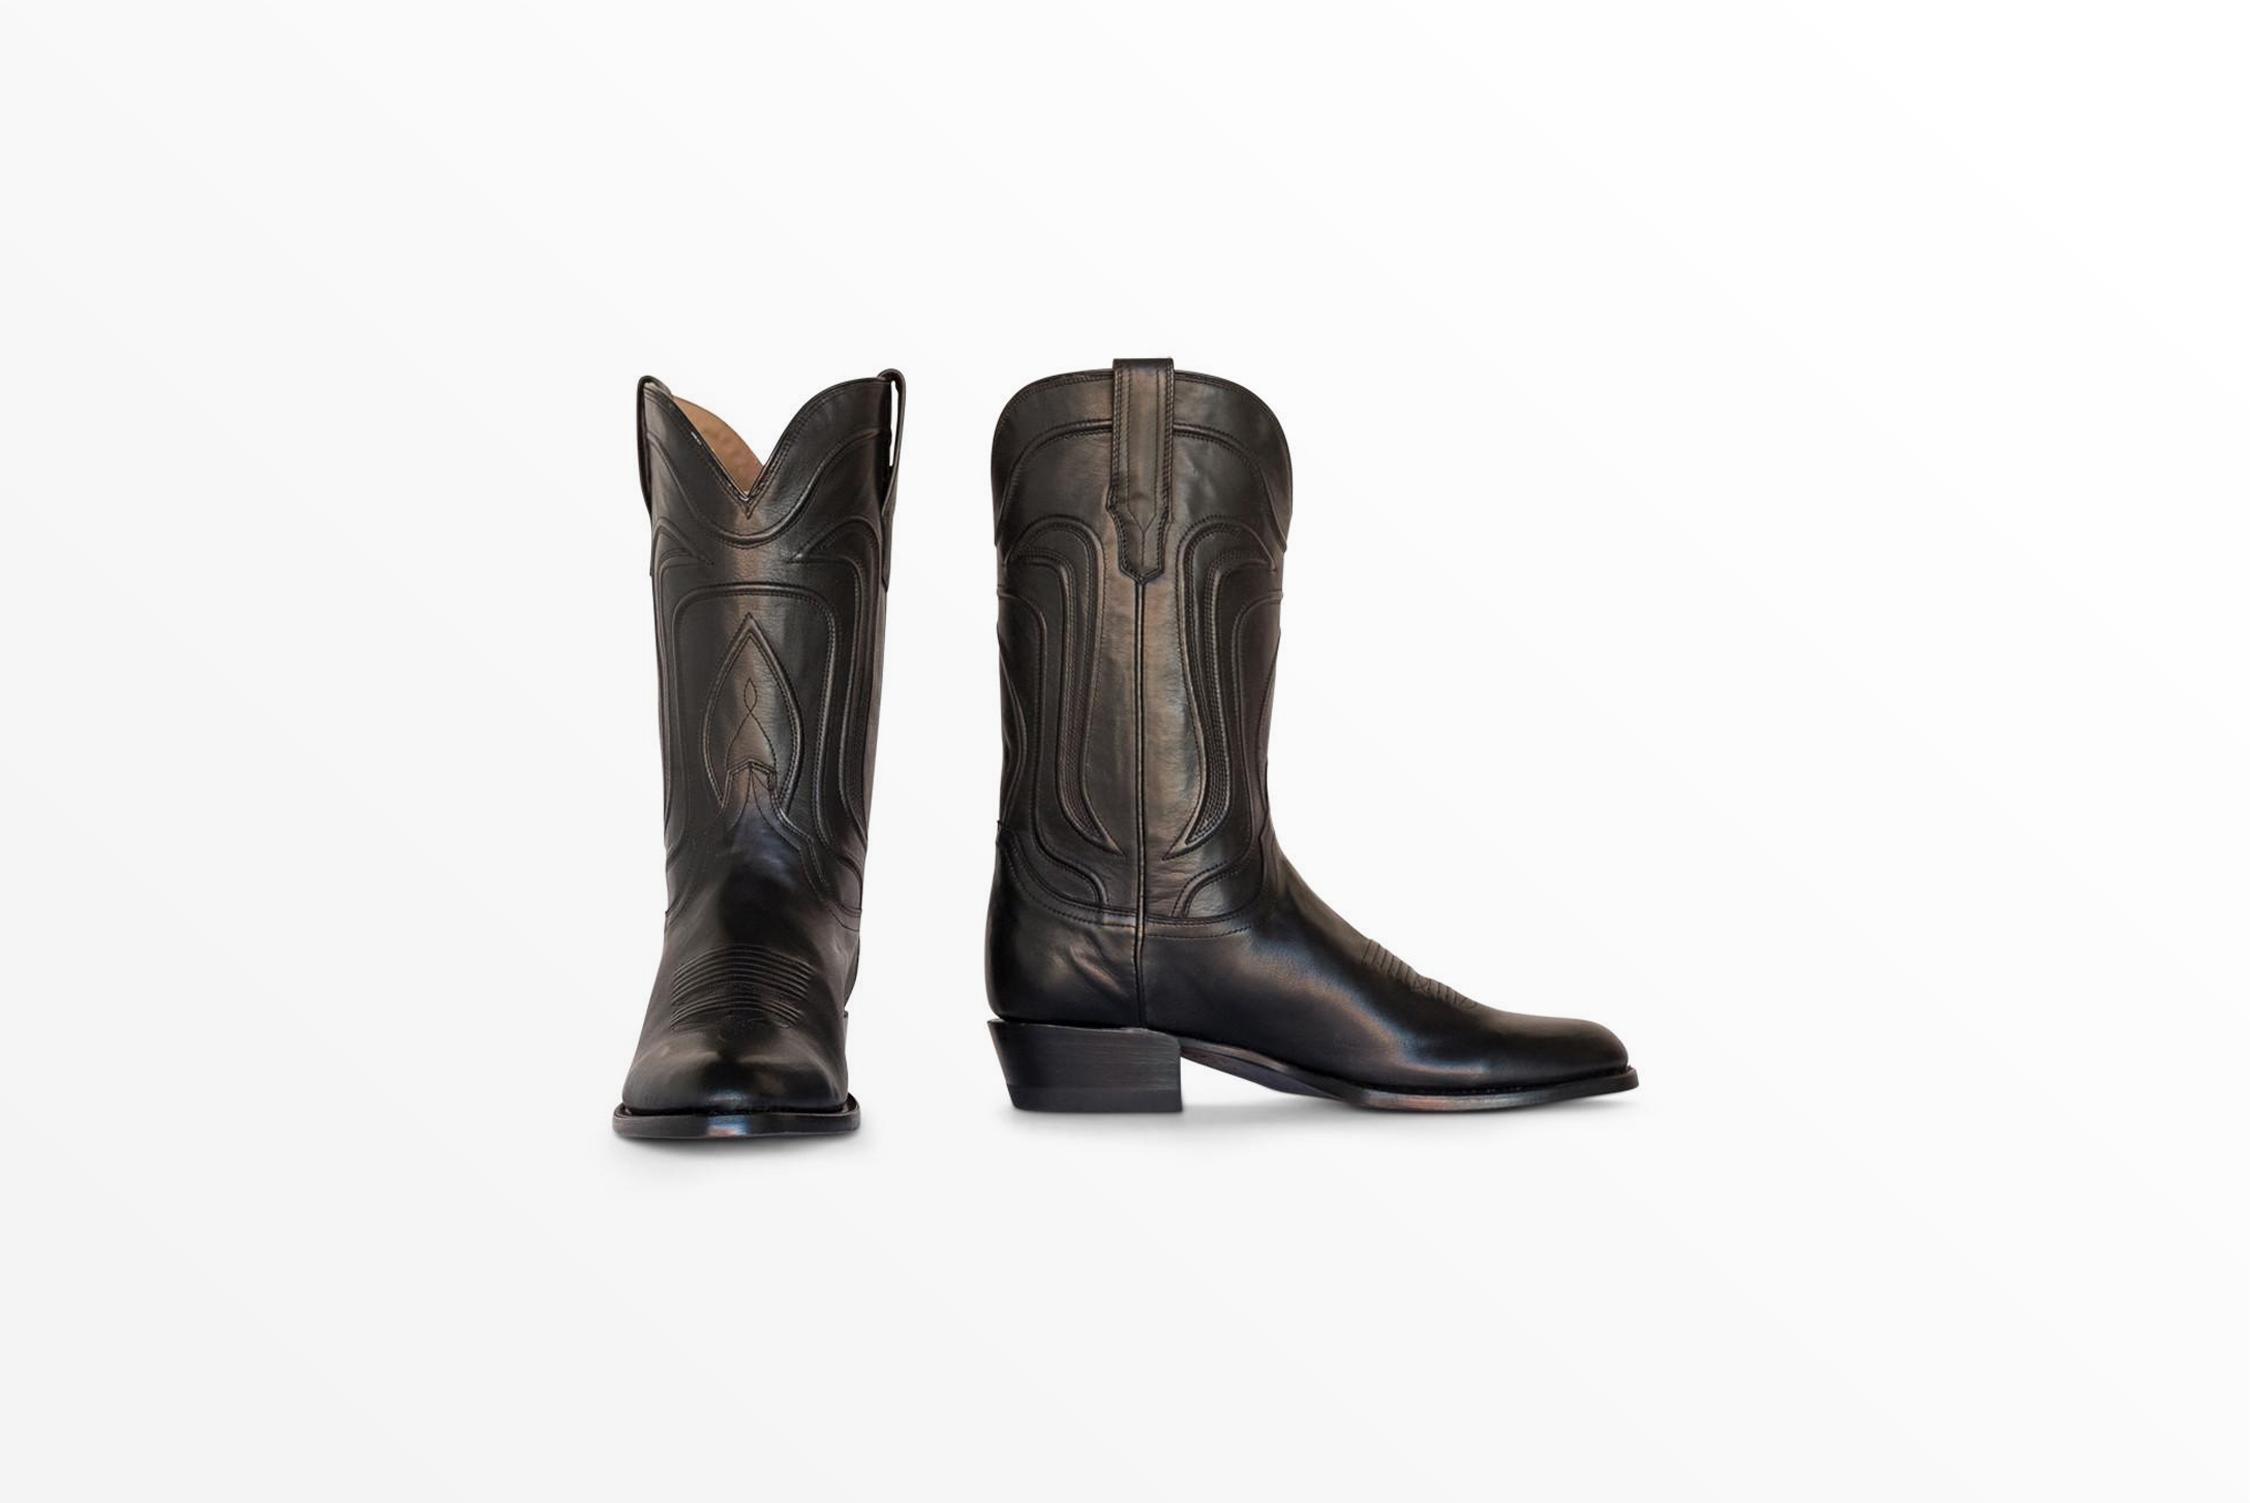 Tecovas Boots - Cartwright Midnight Calf